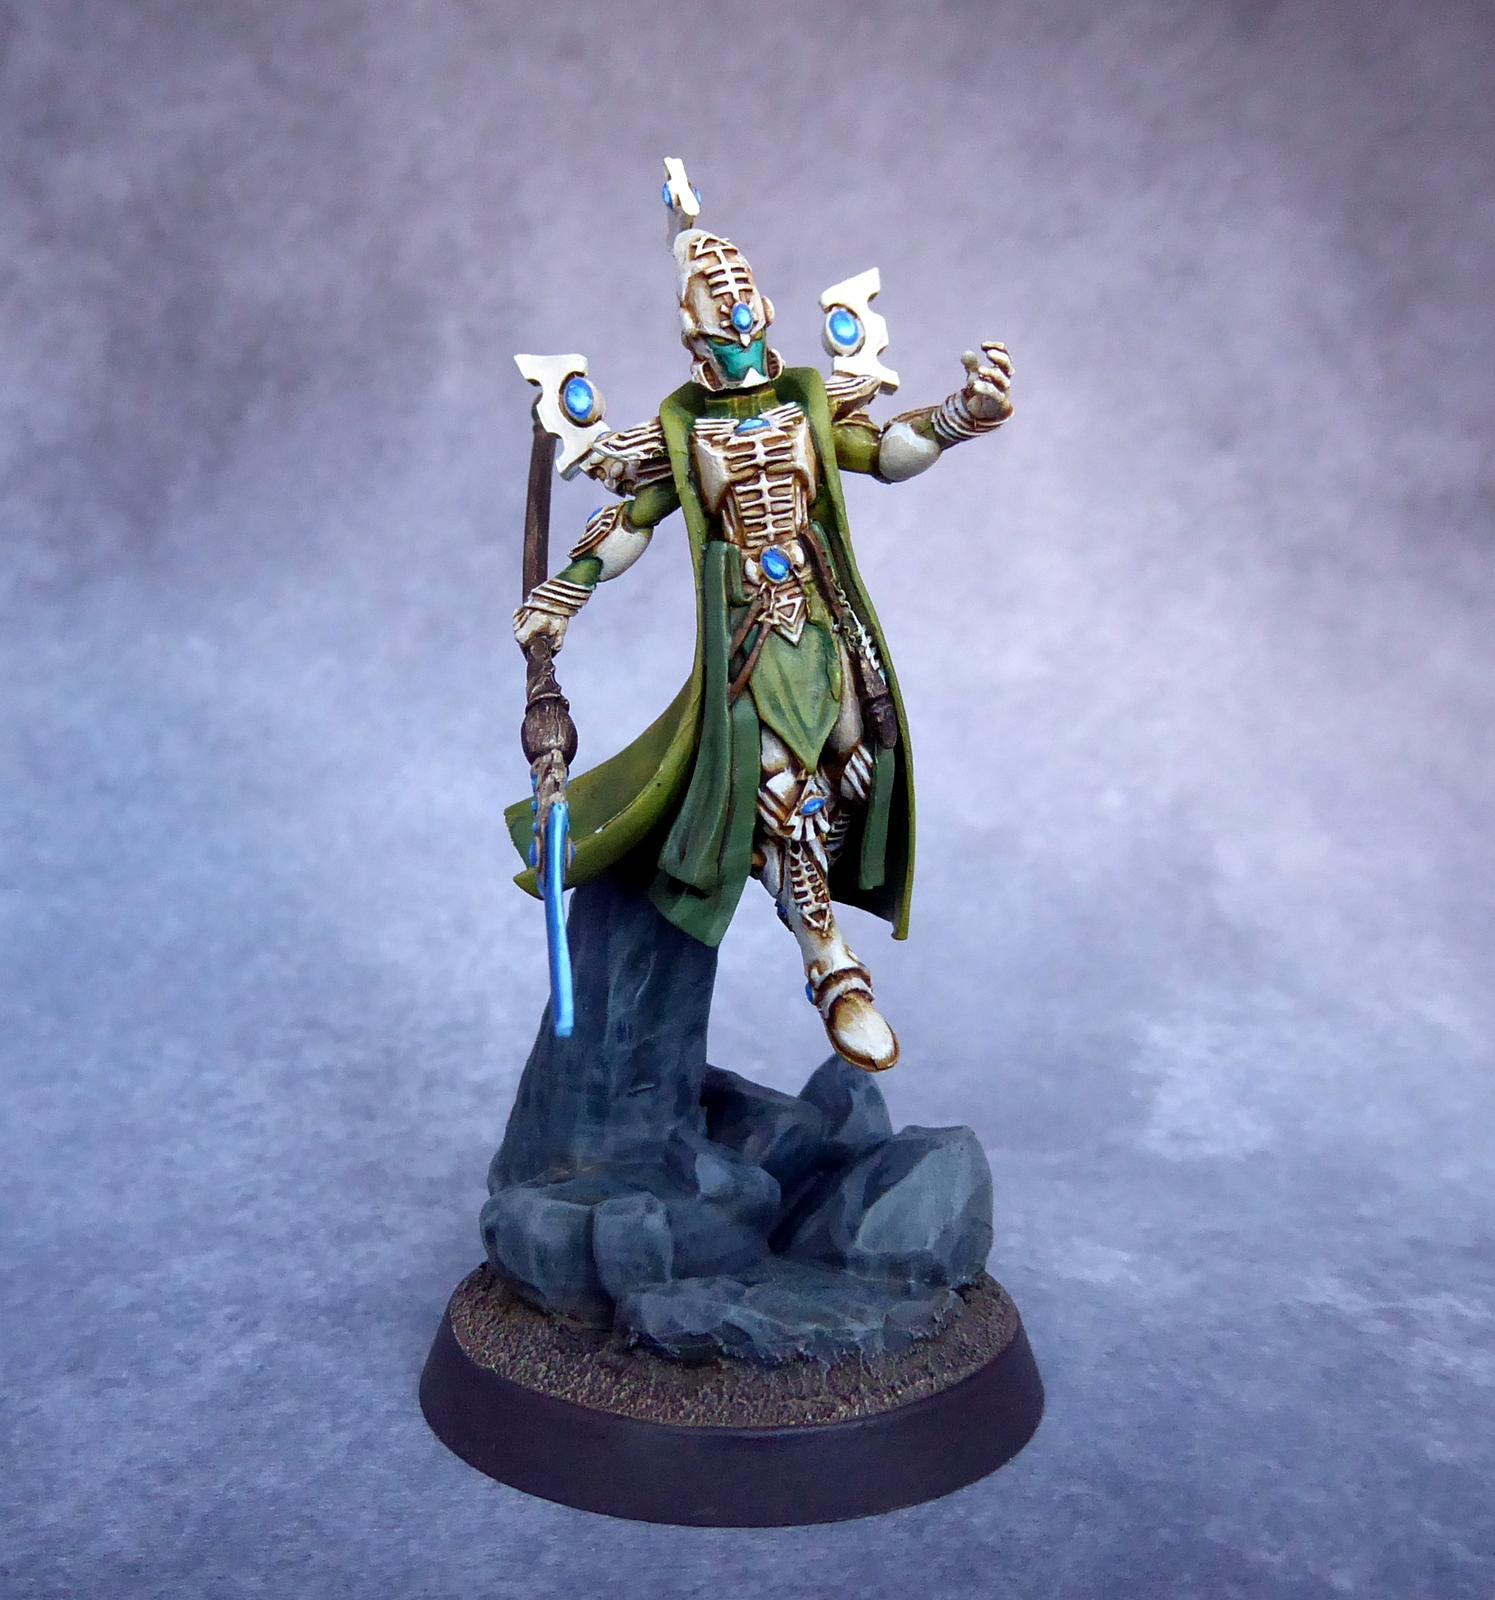 Aeldari, Artel W, Eldar, Exodites, Farseer, Warlock